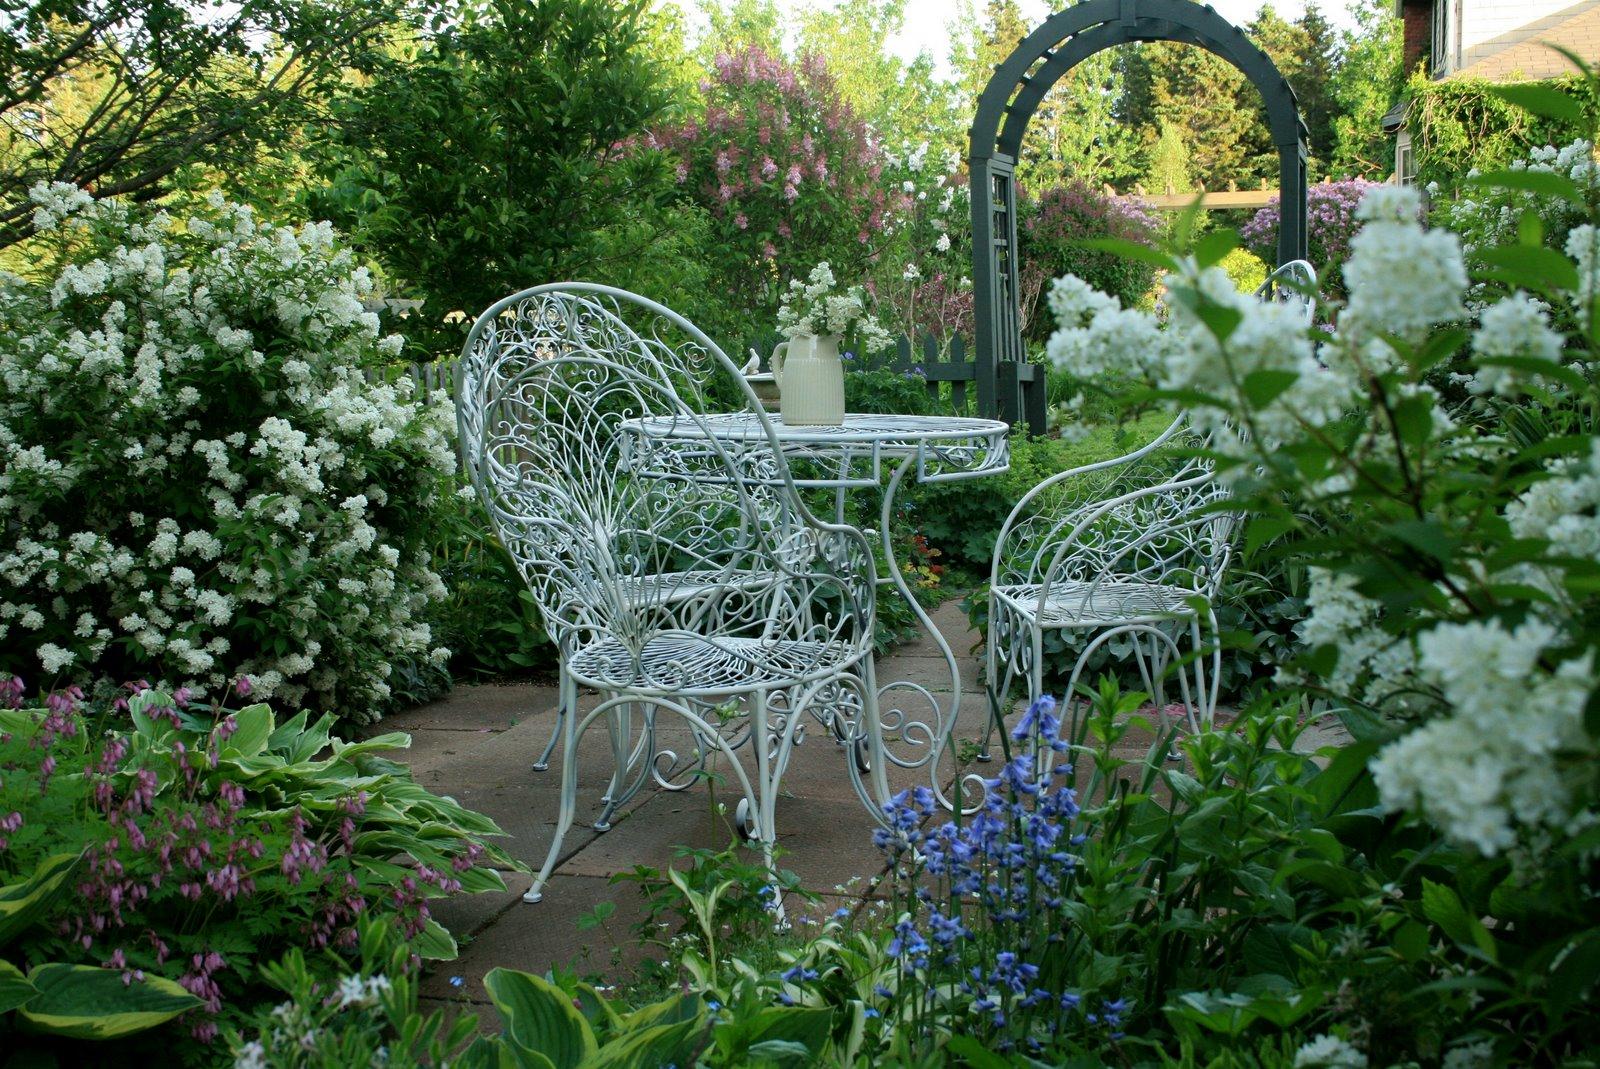 aiken house gardens early spring garden tea. Black Bedroom Furniture Sets. Home Design Ideas